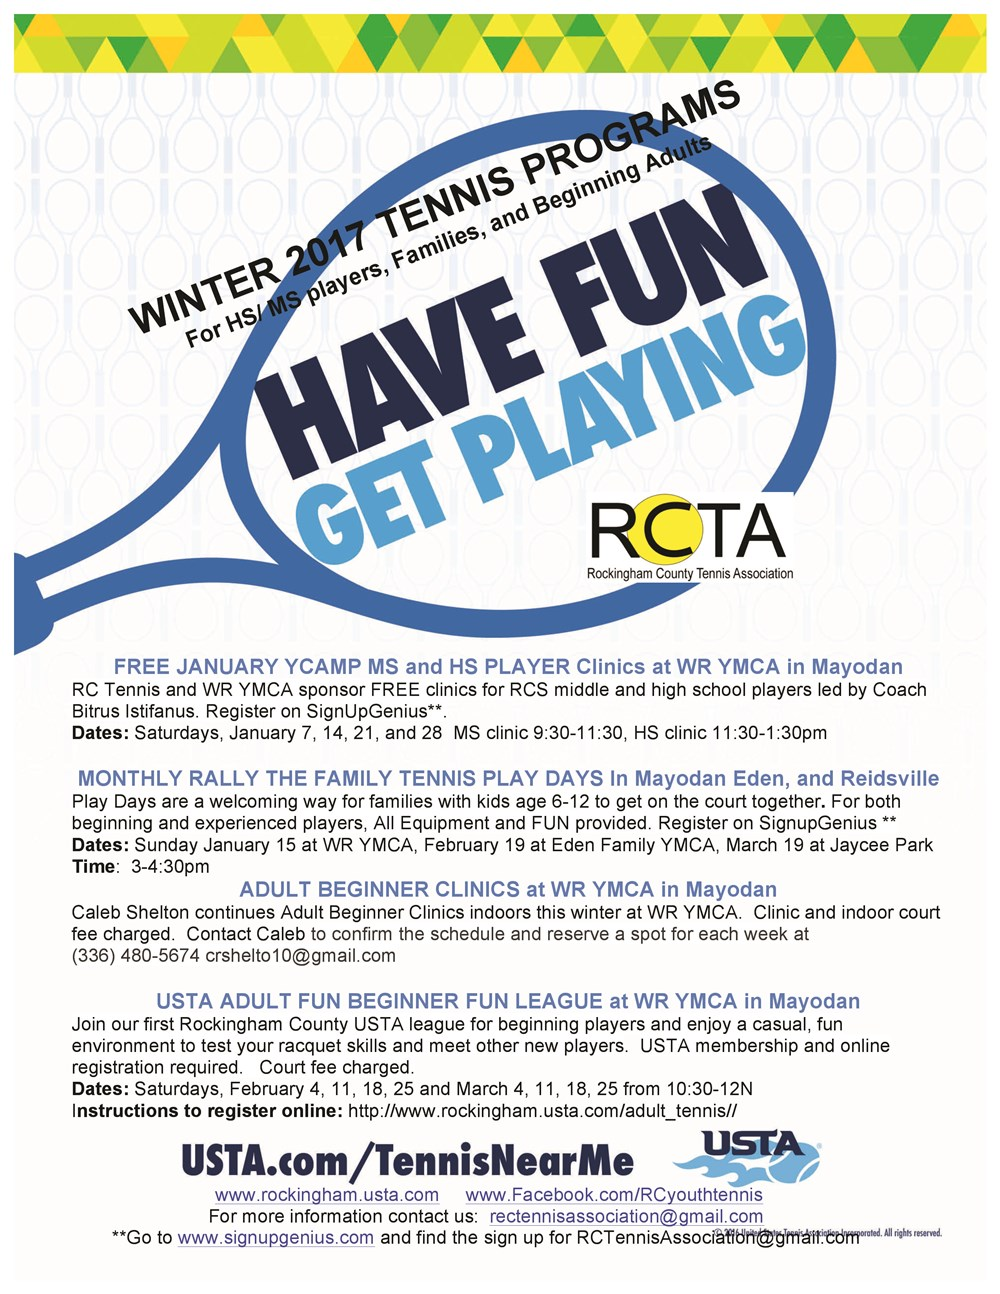 RC_Tennis_Winter_2017_Program_flyer_EOJ_January_ad-page-0